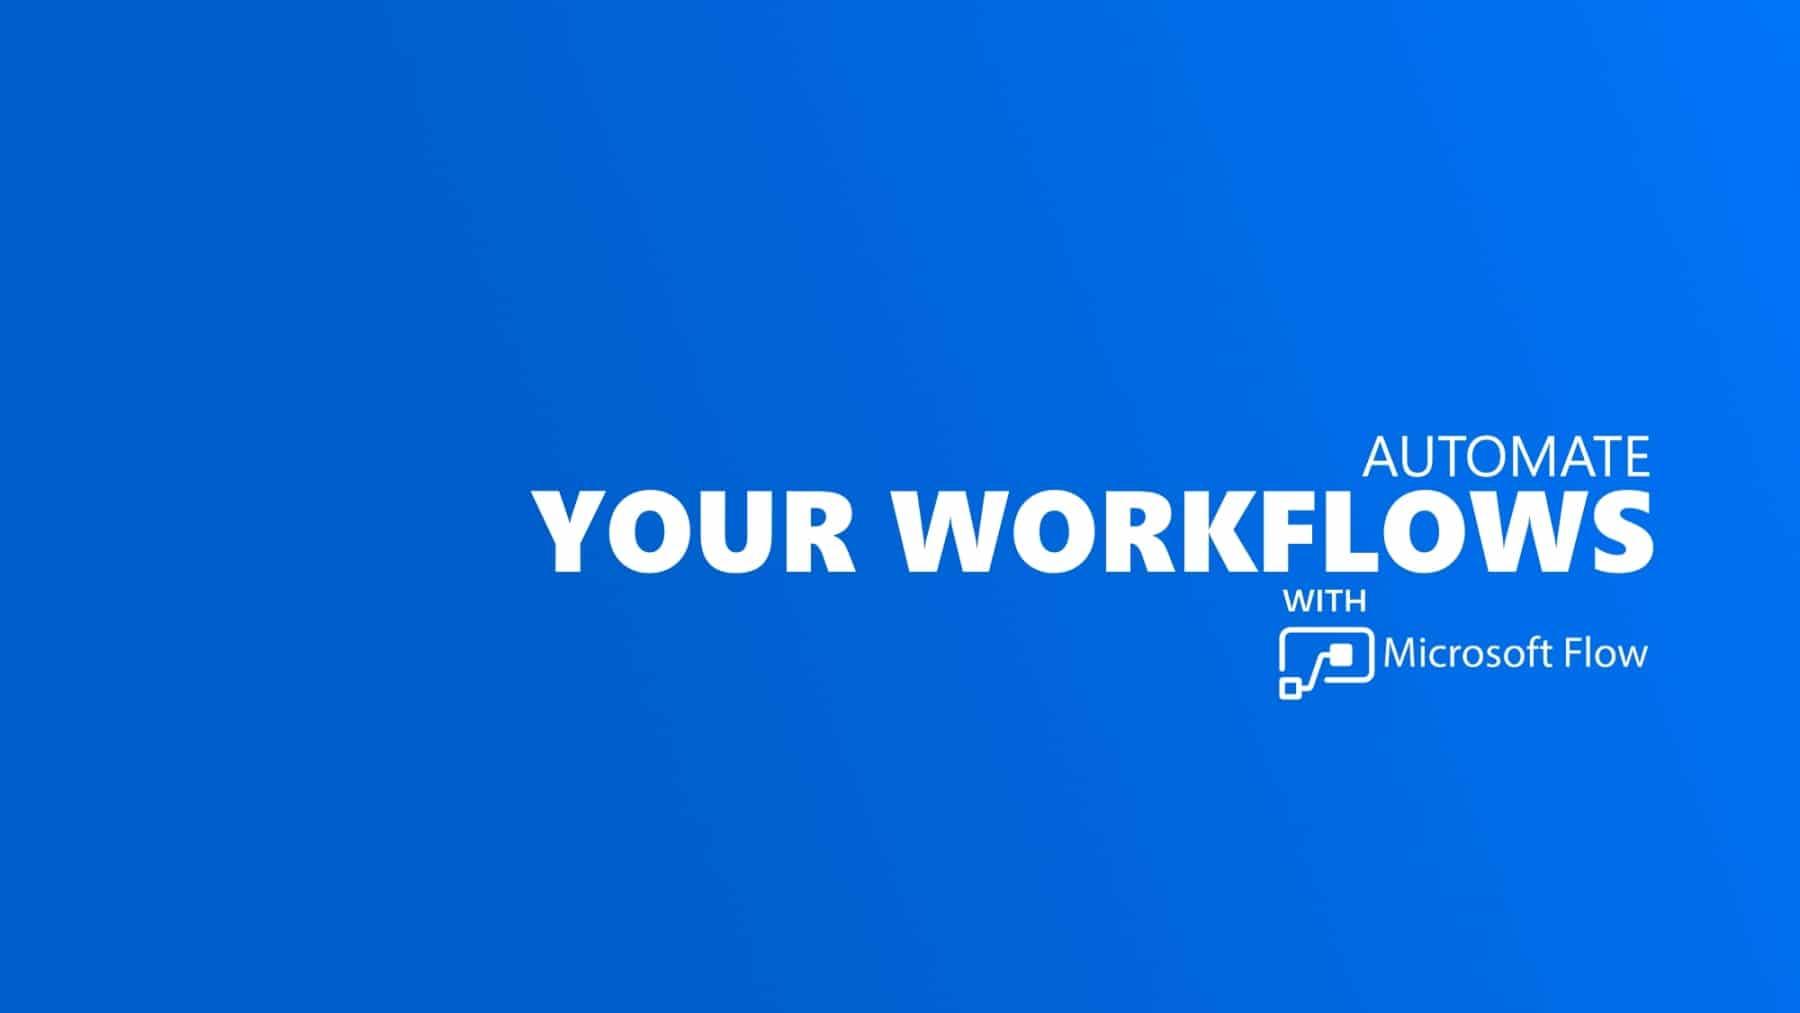 Automate Your Workflows With Microsoft Flow Titelbild